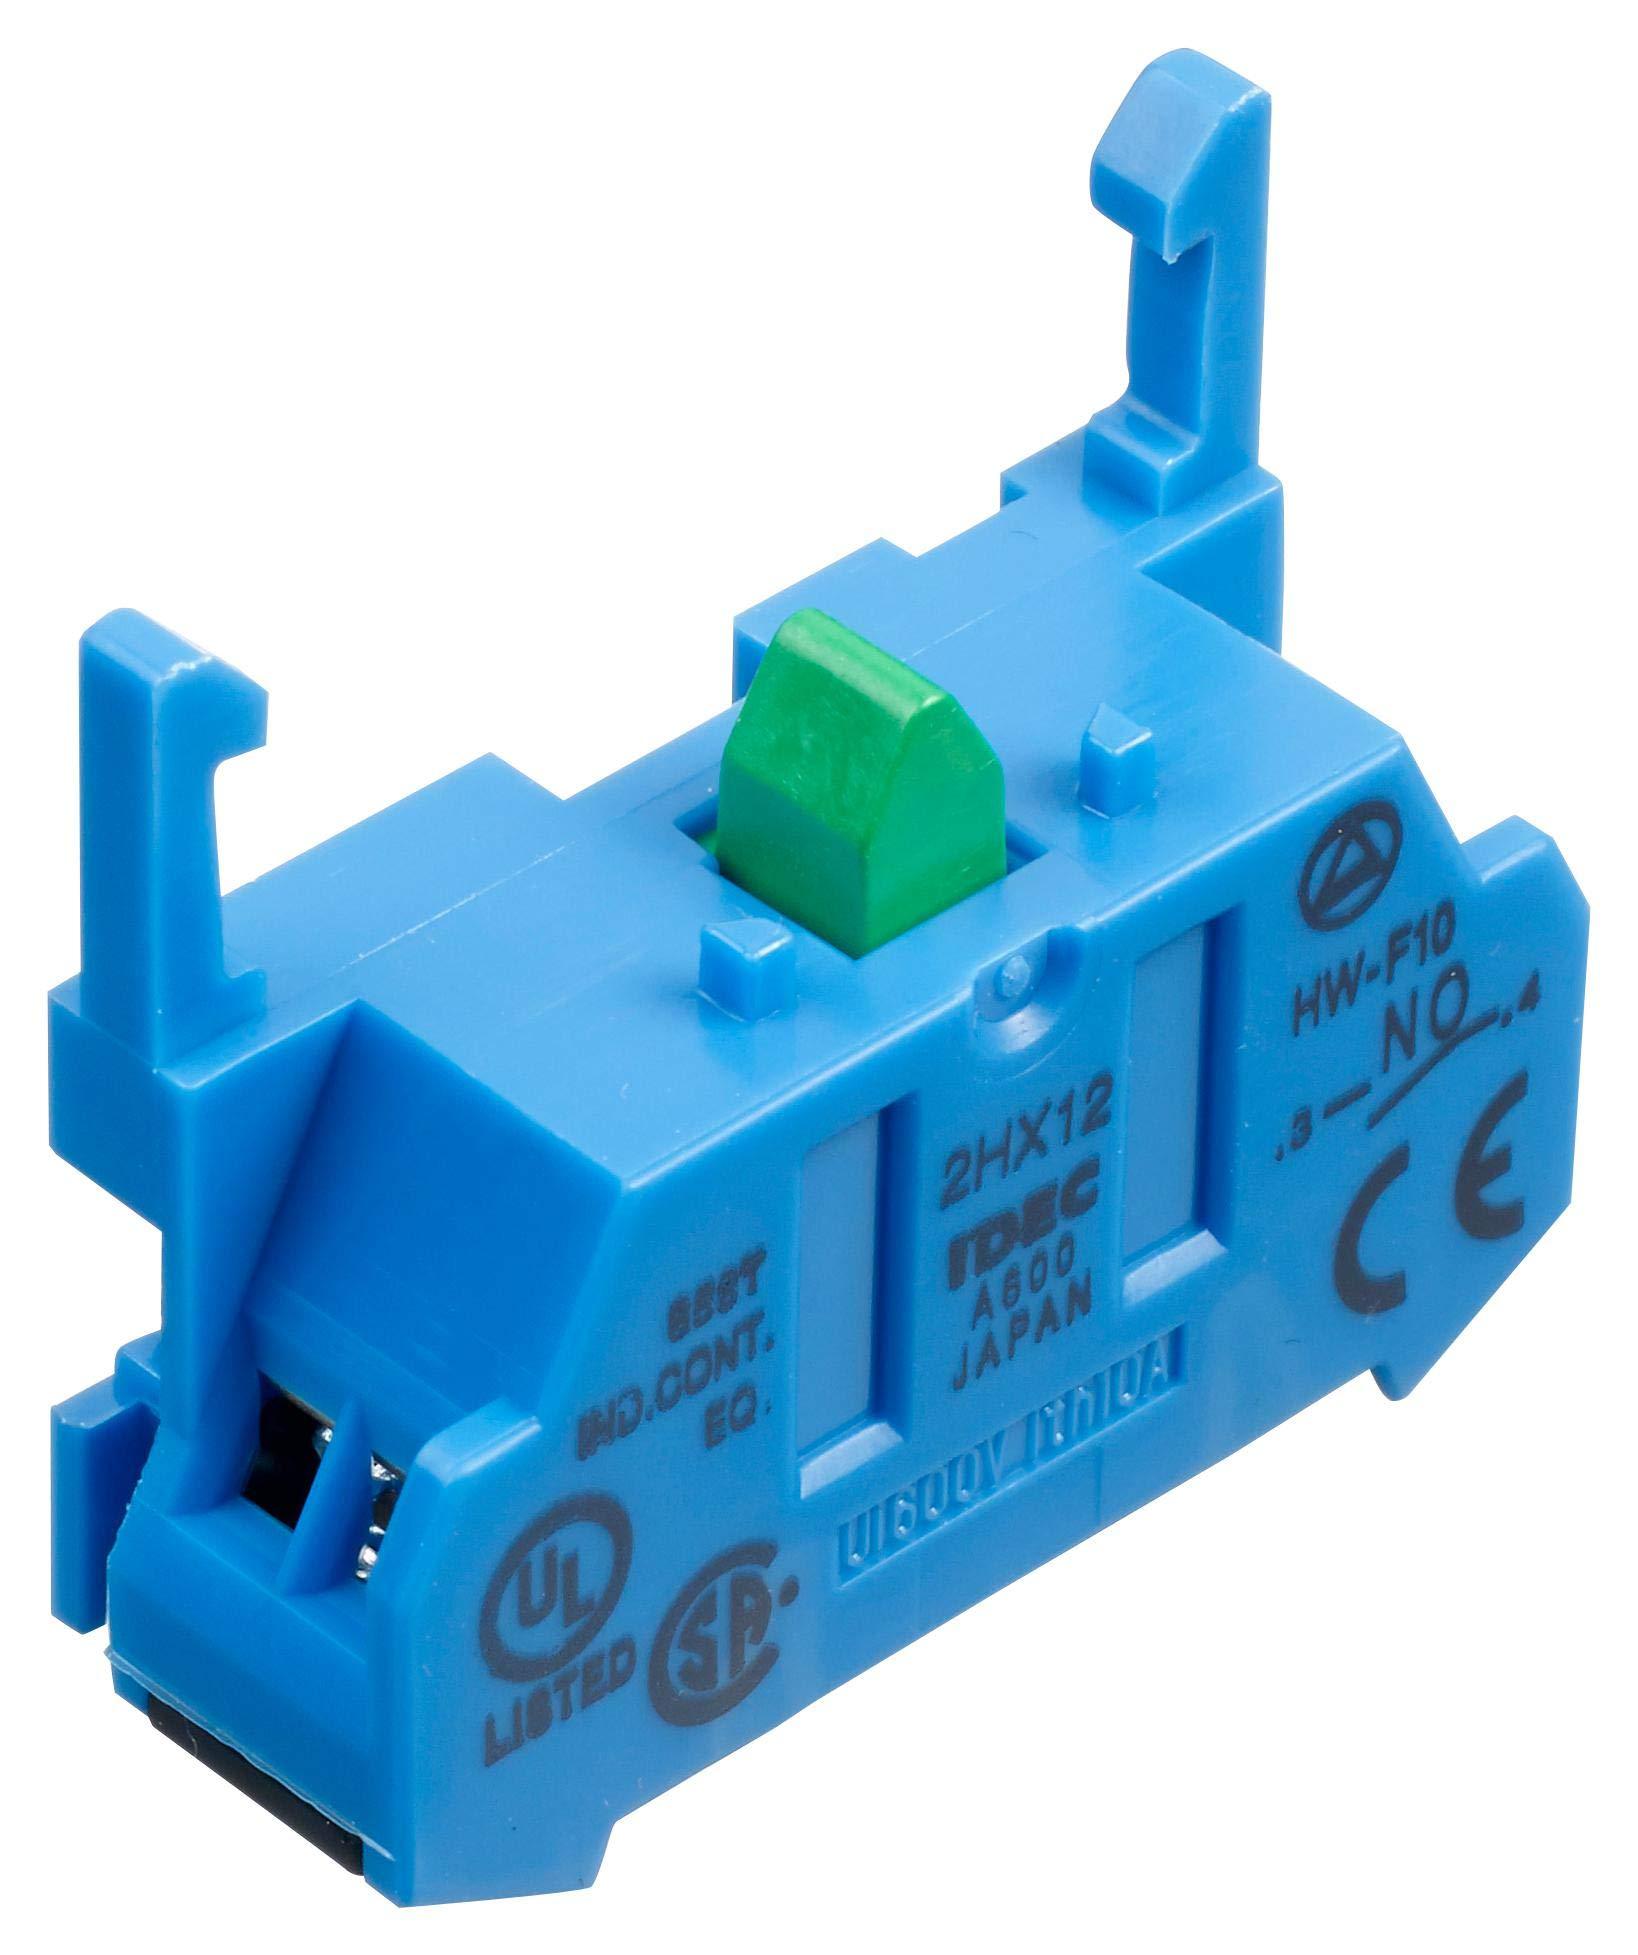 HW-F10 - CONTACT BLOCK, 1 POLE, 10A, 240VAC (Pack of 10) (HW-F10)